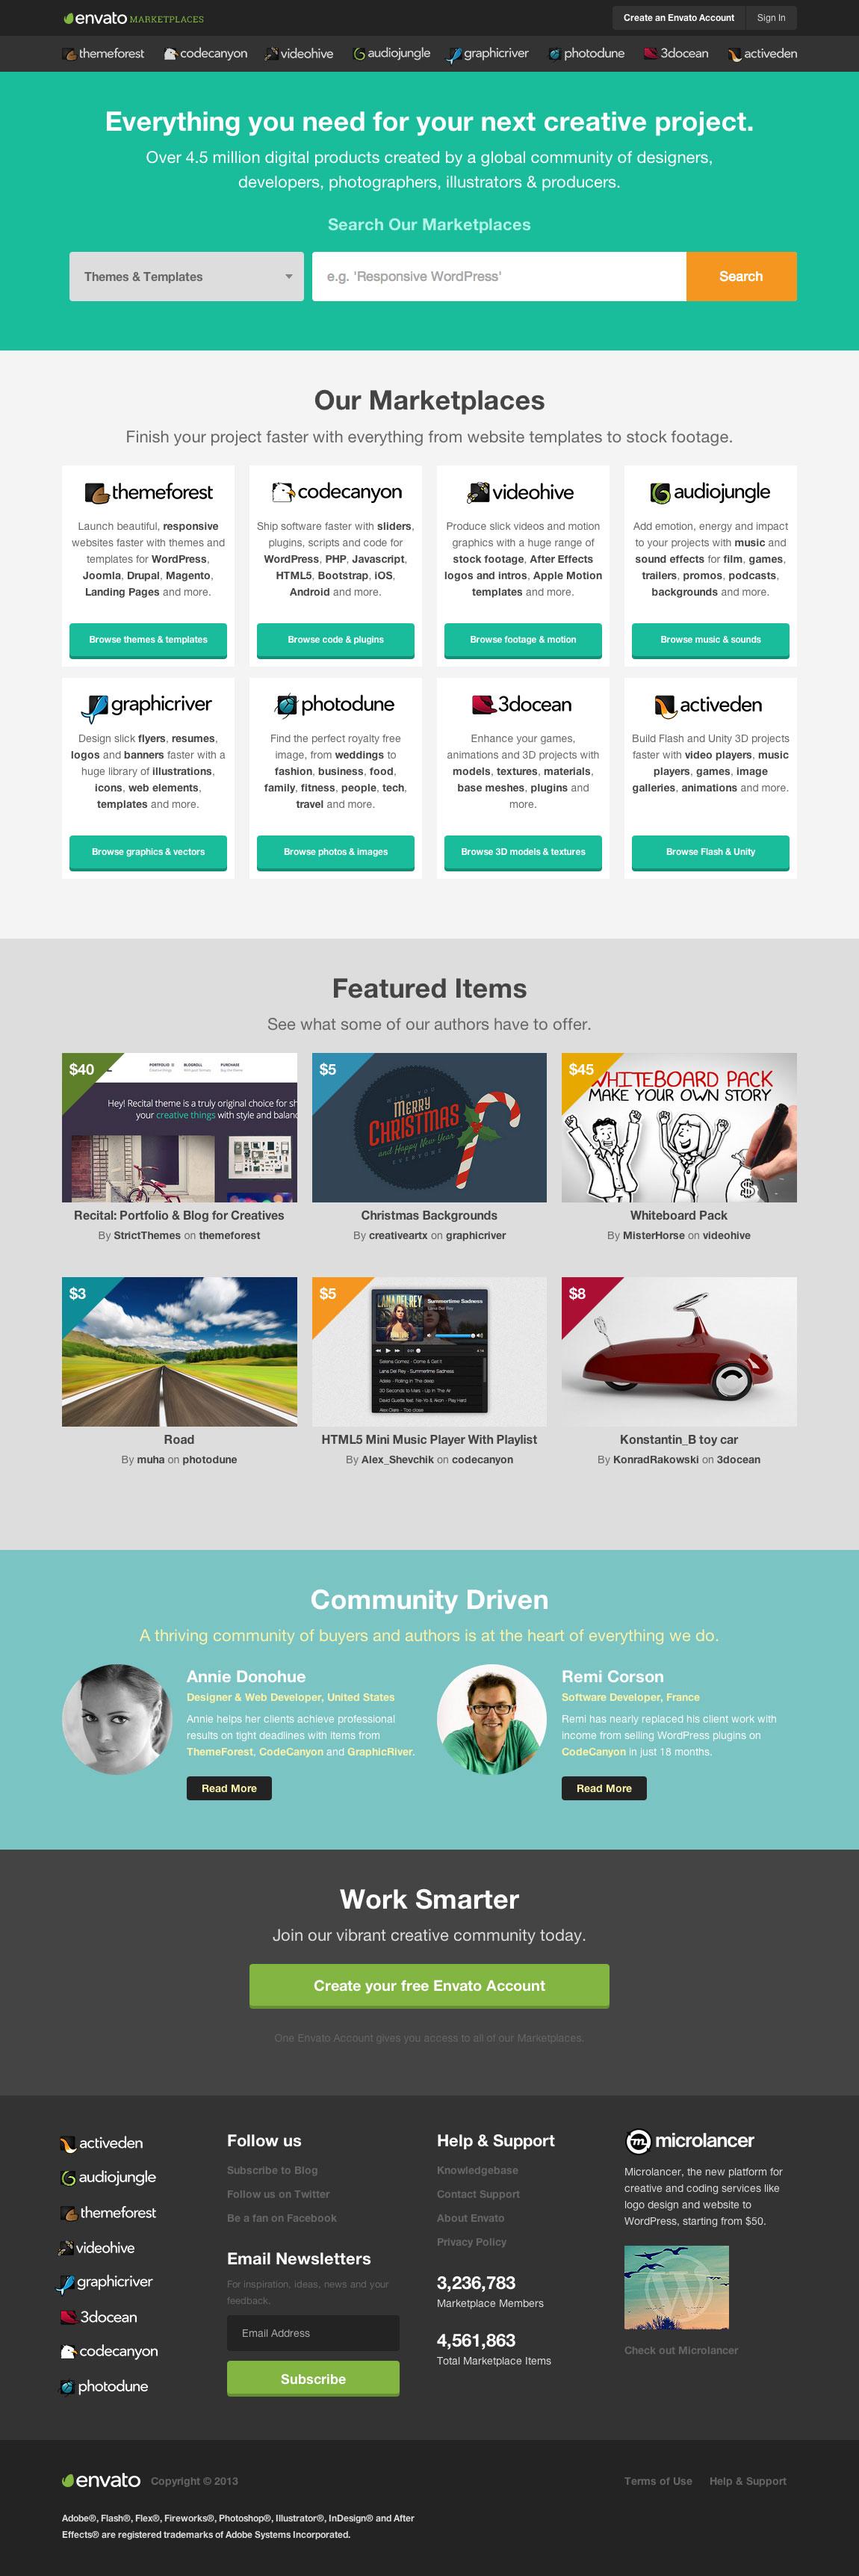 Envato Marketplaces Website Screenshot